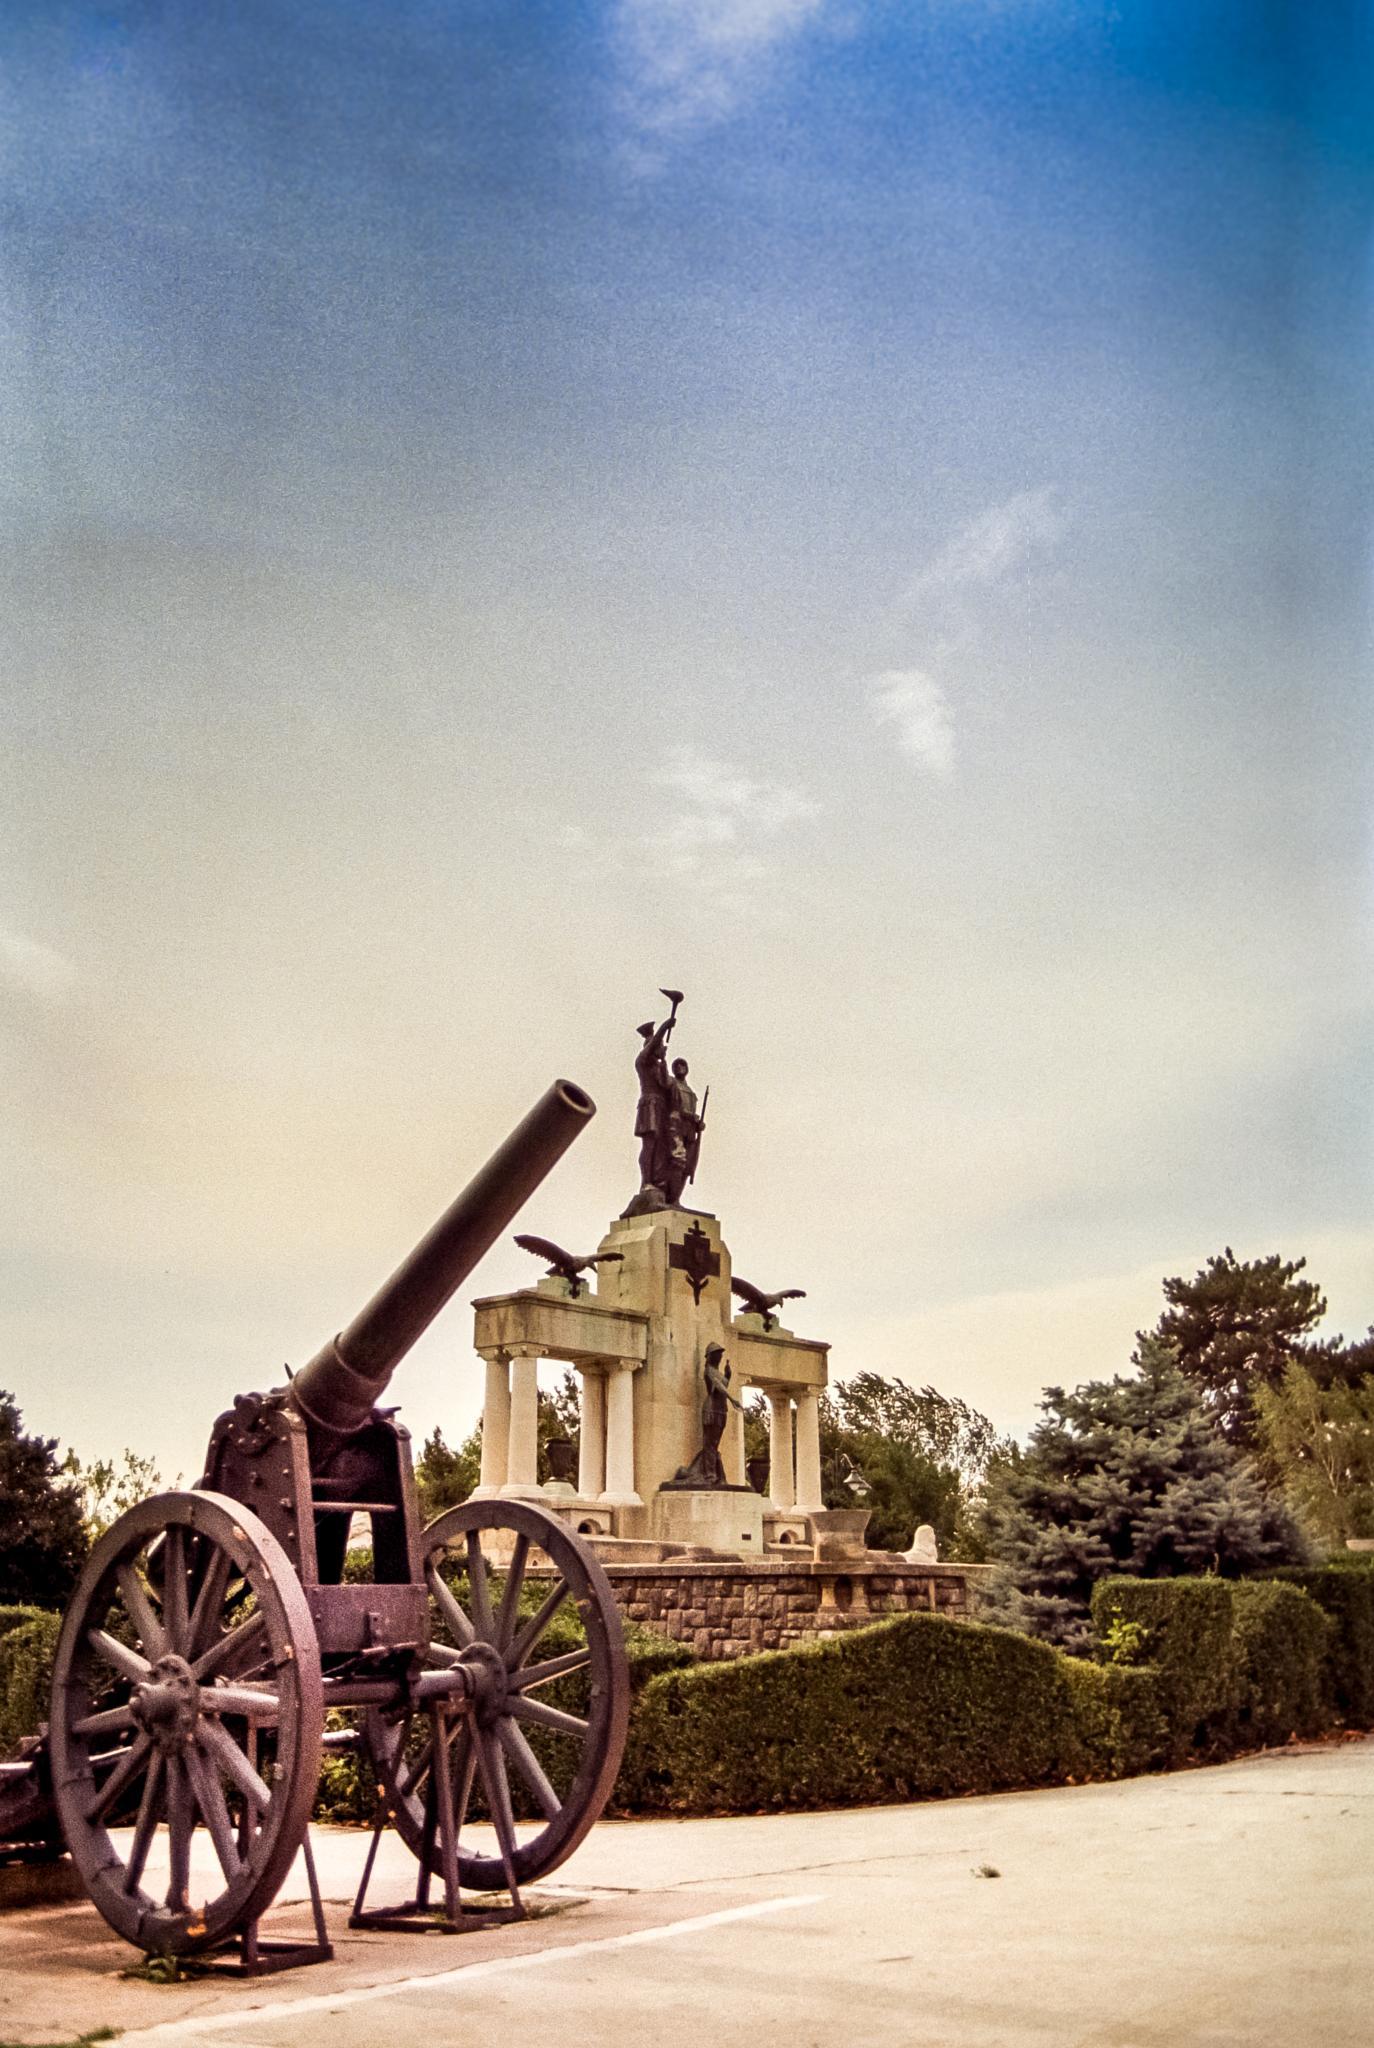 Heroes Monument by nedelciu.alexandru.1